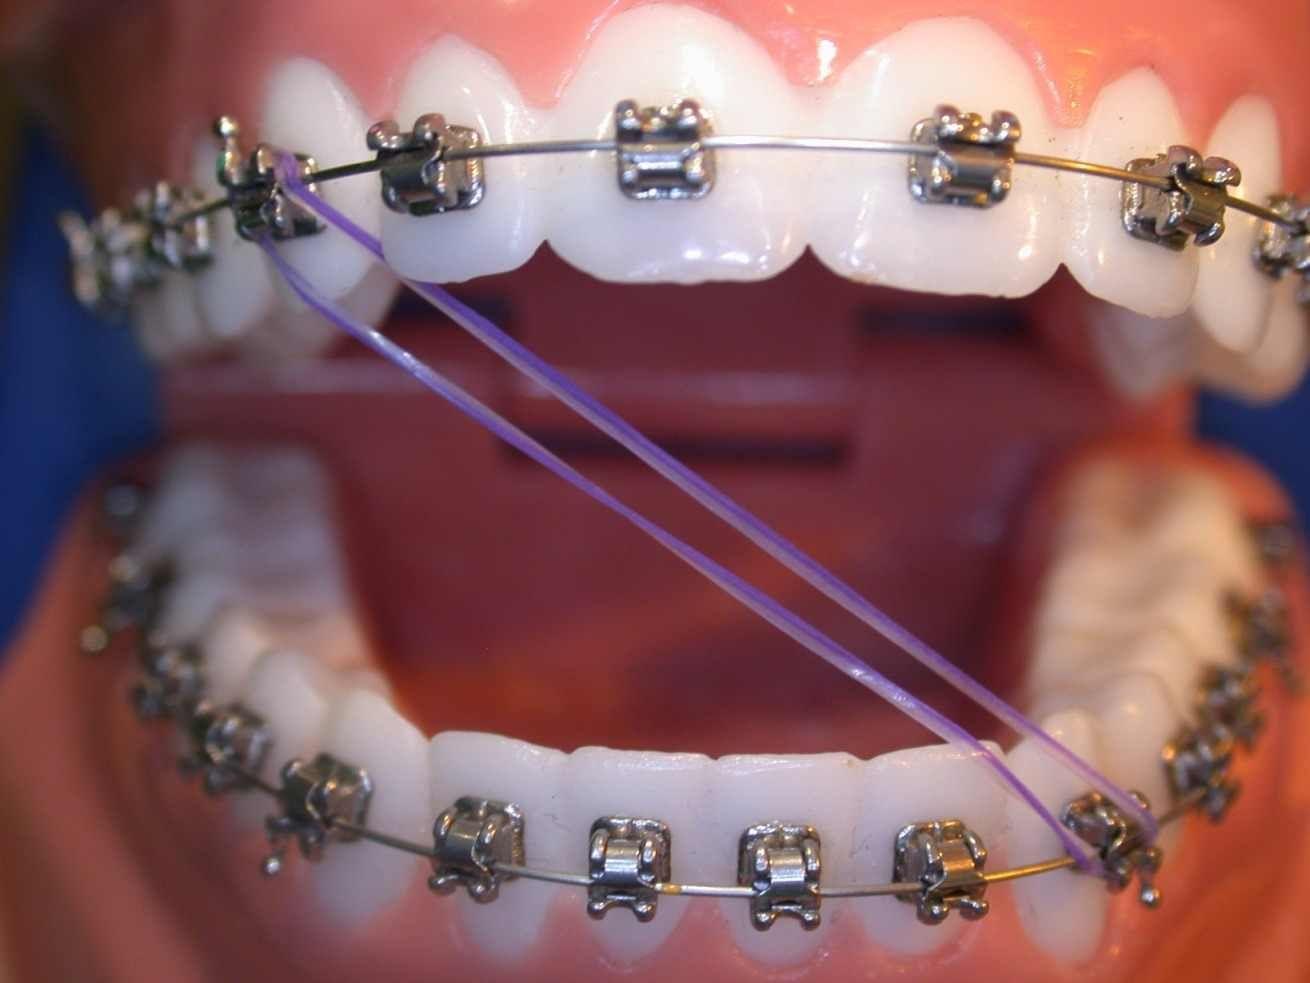 Cosas Que Le Pasan A Todas Las Personas Que Usan Brackets Brackets Dentales Ligas Para Brackets Brackets